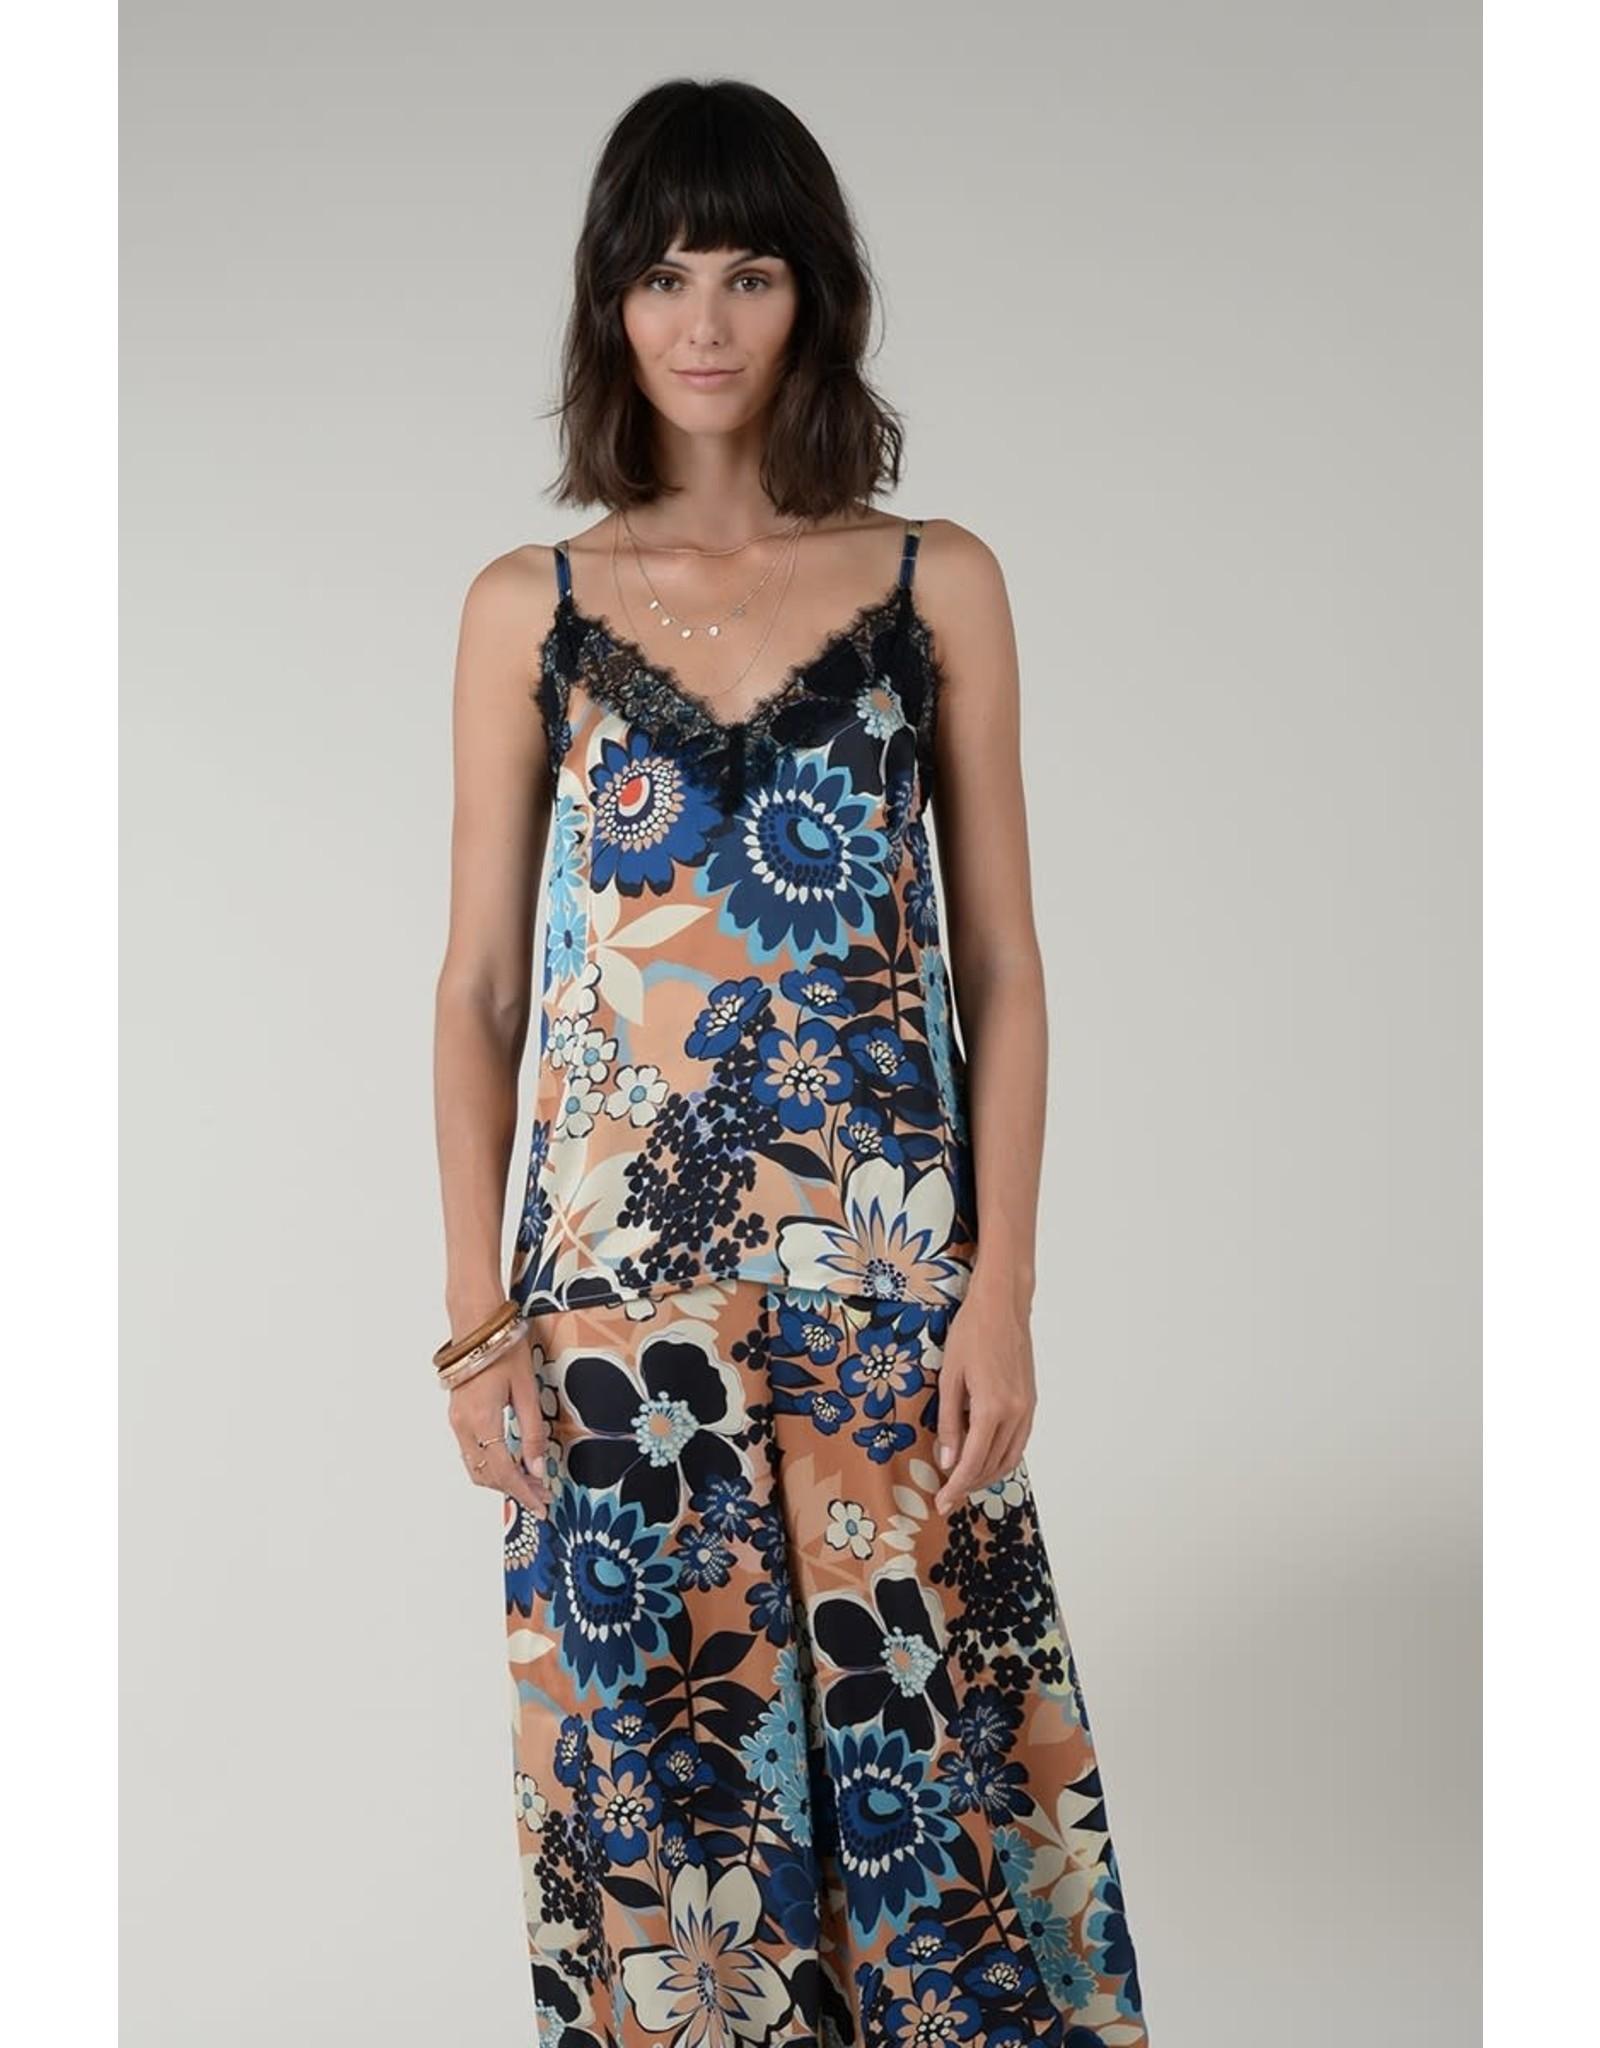 Molly Bracken Molly Bracken - Strappy satin and lace camisole camisole (Riviera camel)